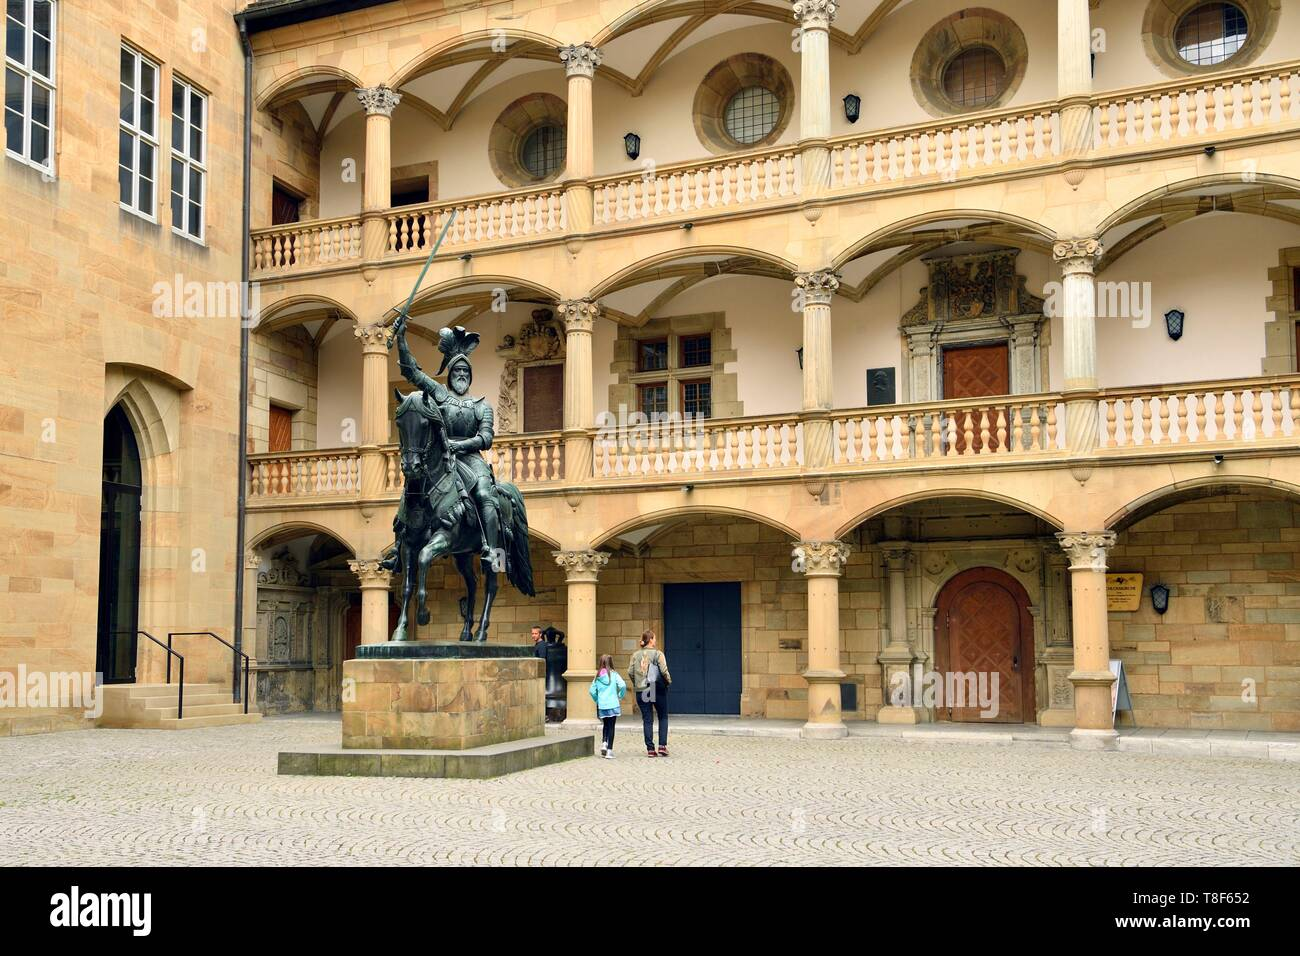 Germany, Baden Wurttemberg, Stuttgart, Schillerplatz, Wurttemberg regional museum (Landesmuseum Wurttemberg) in the old Castle (altes Stiftsschloss) and Equestrian statue of duke Eberhard im Bart in the interior courtyard - Stock Image